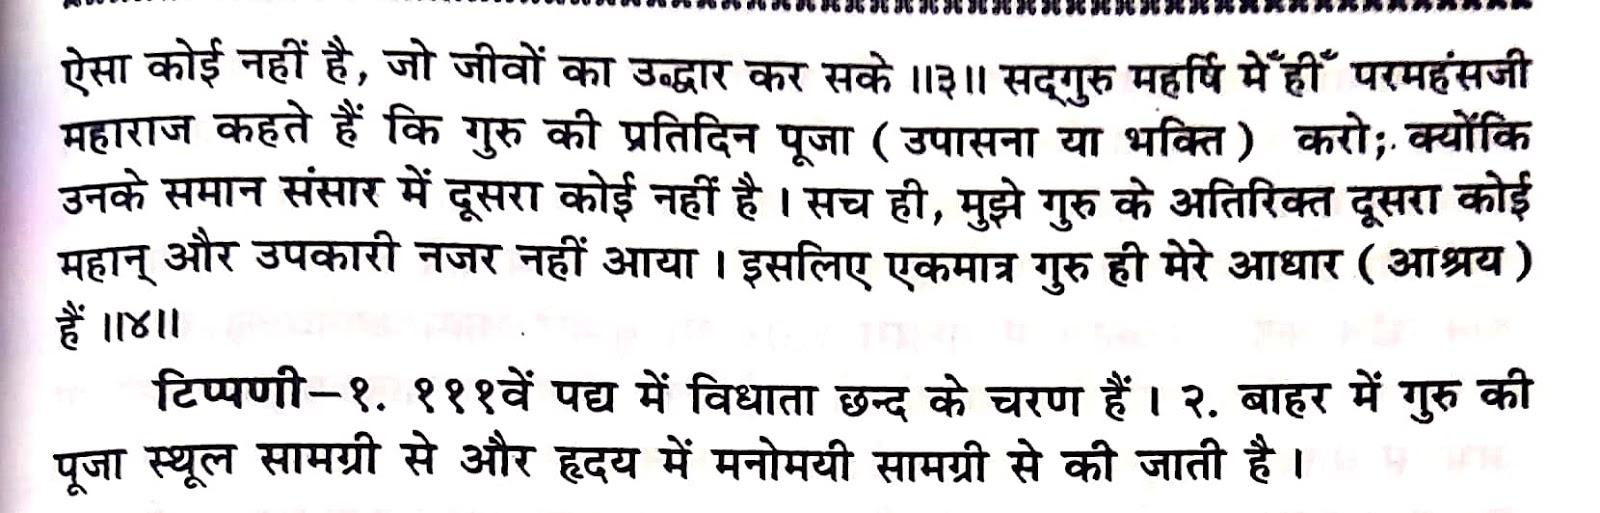 "P111, Importance of the Guru's grace, ""बिना गुरु की कृपा पाये,...''  महर्षि मेंहीं पदावली भजन अर्थ सहित। पदावली भजन नंबर 111 का शेष भावार्थ और टिप्पणी।"